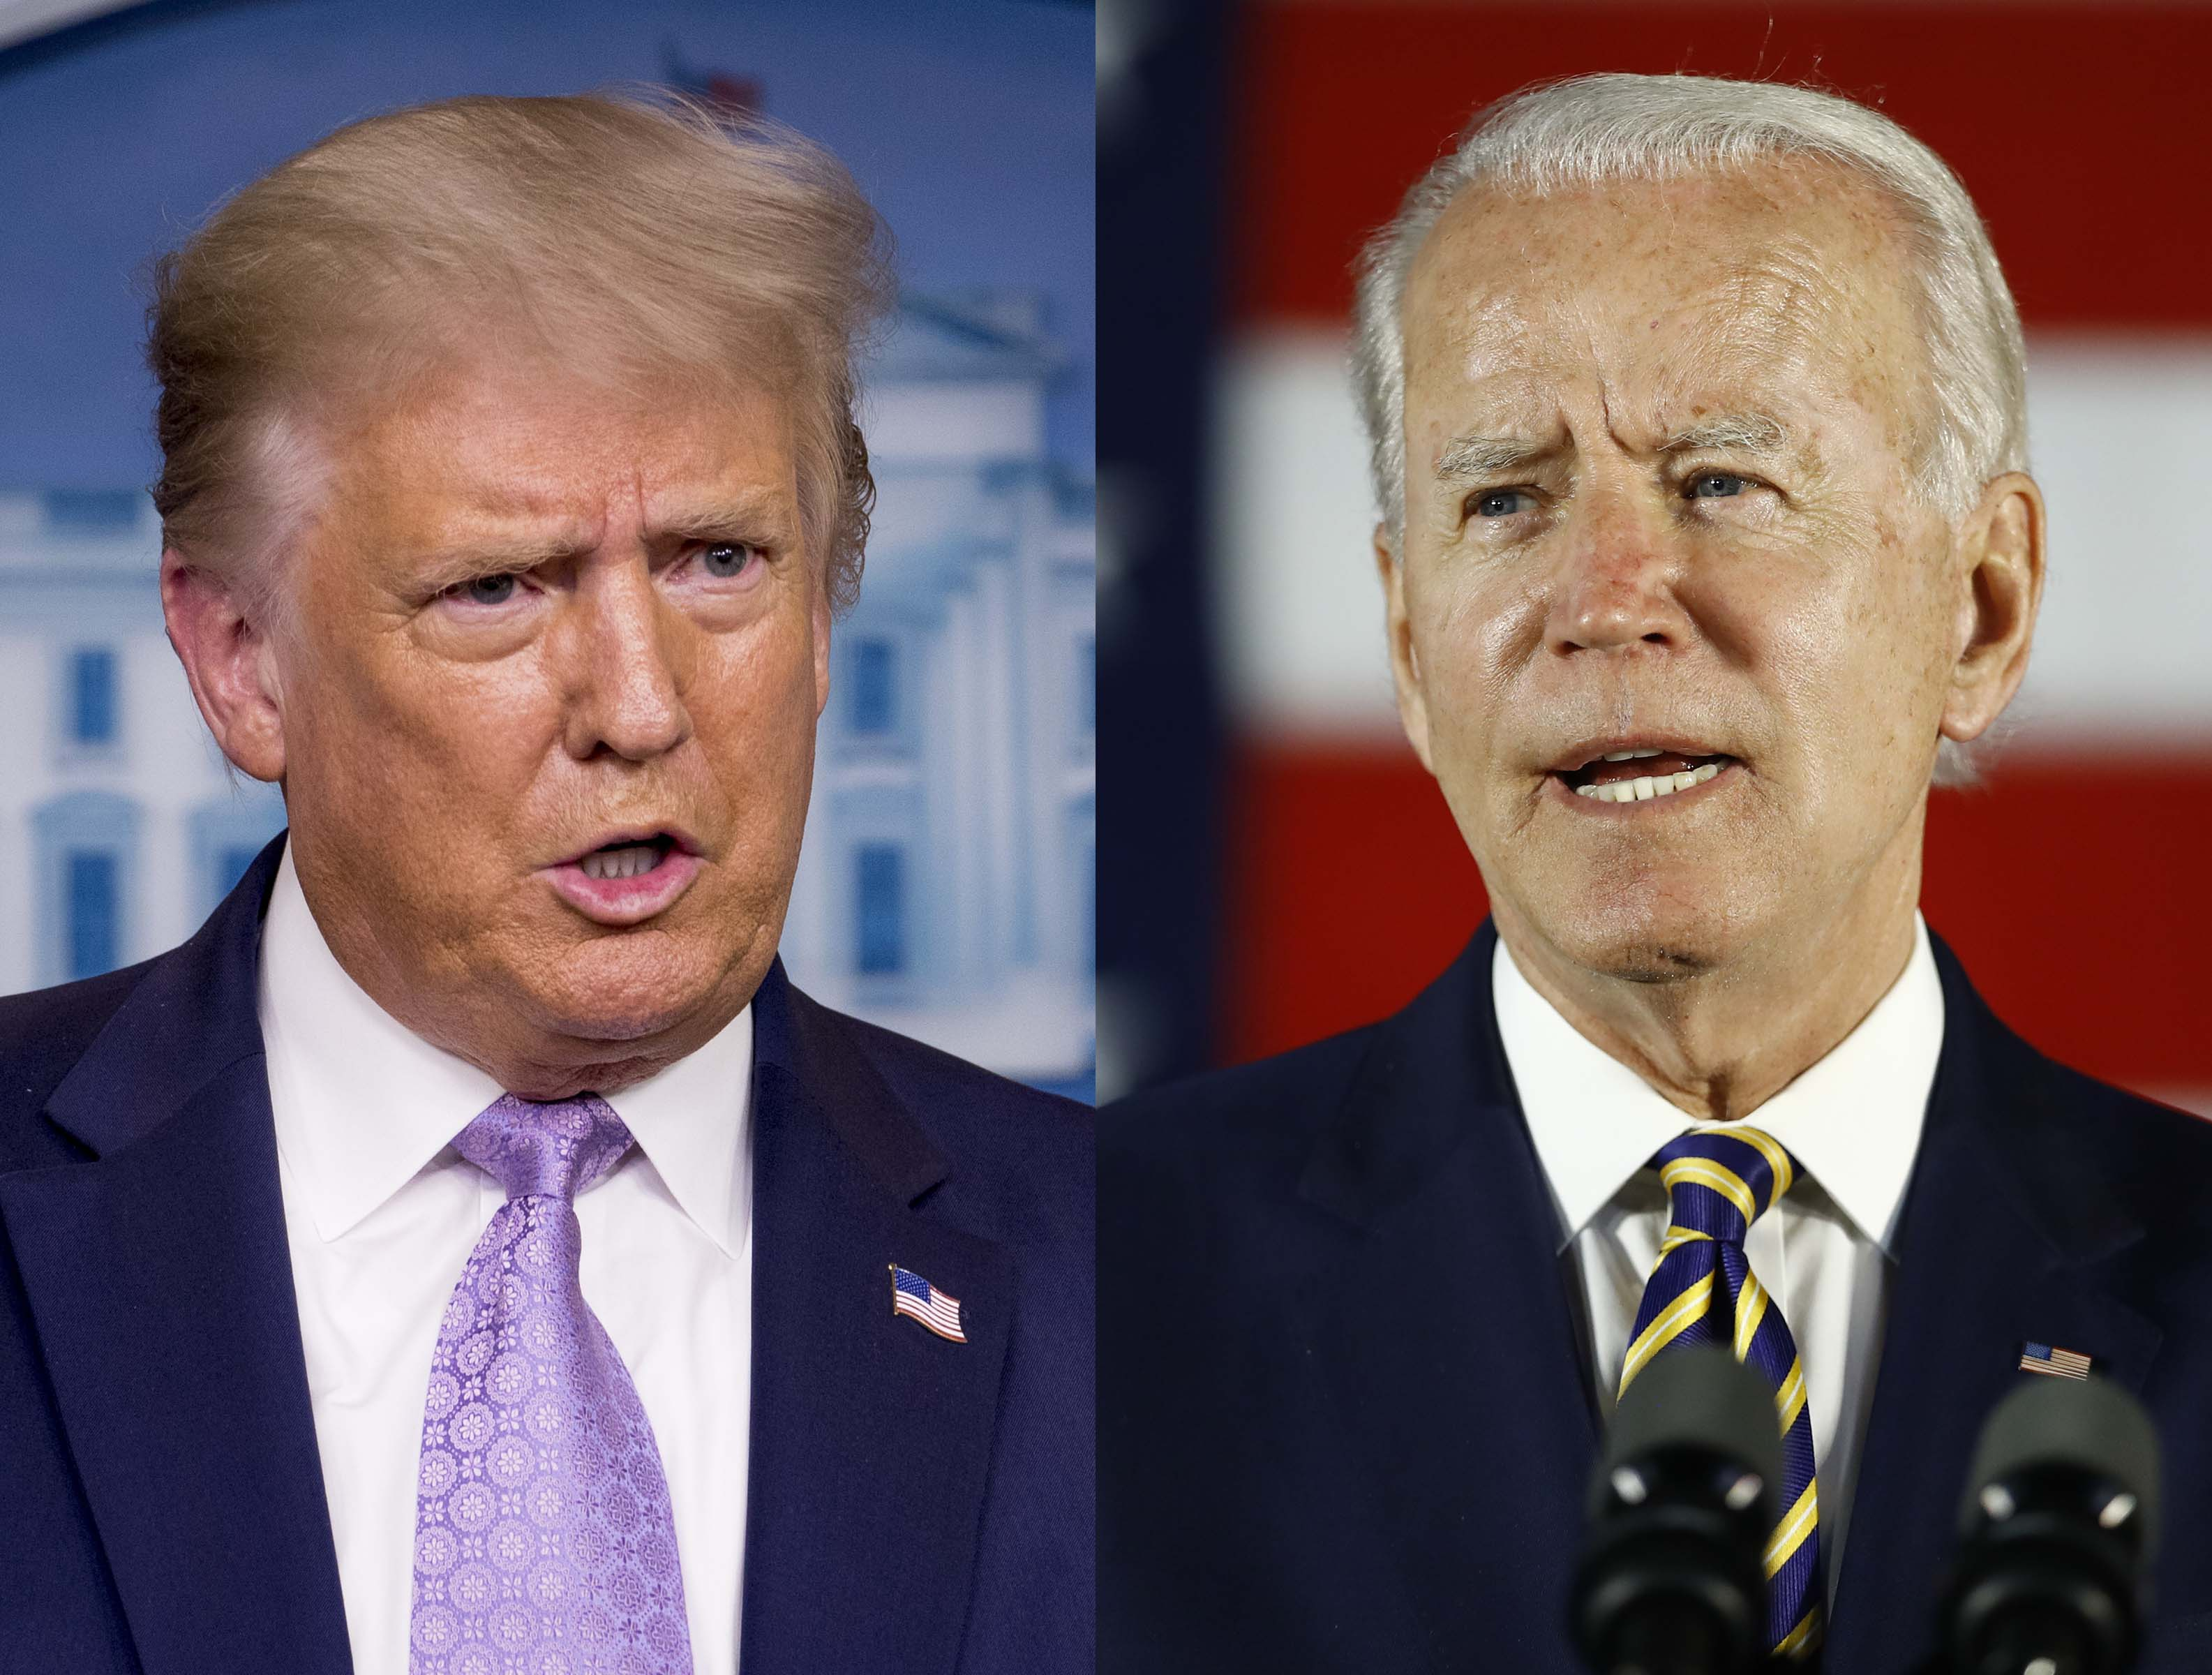 President Donald Trump and Democratic presidential nominee Joe Biden.